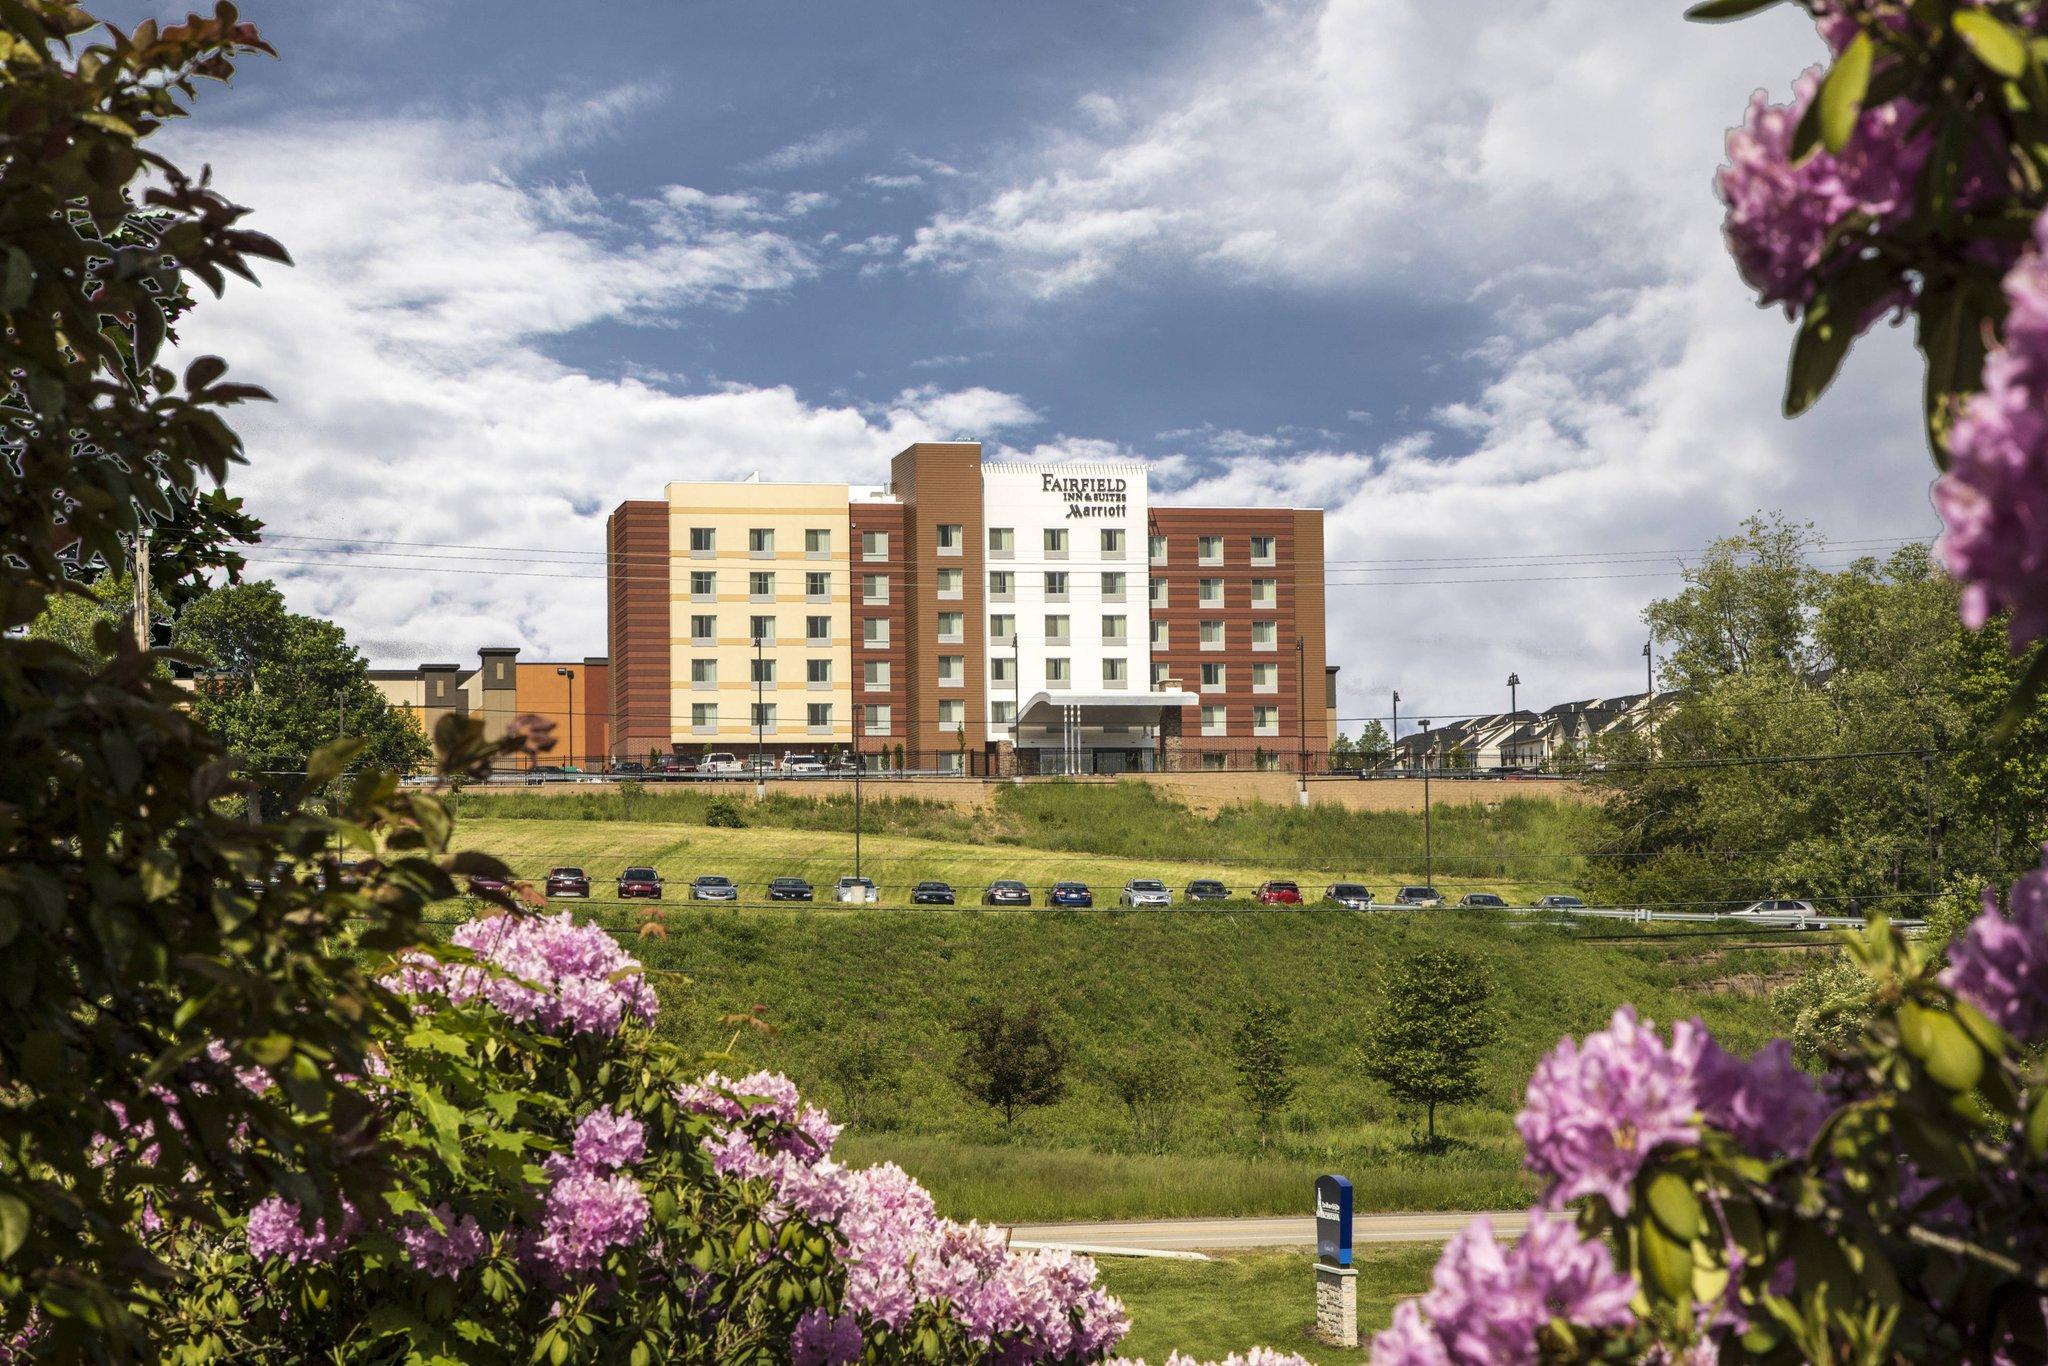 Fairfield Inn & Suites Pittsburgh North